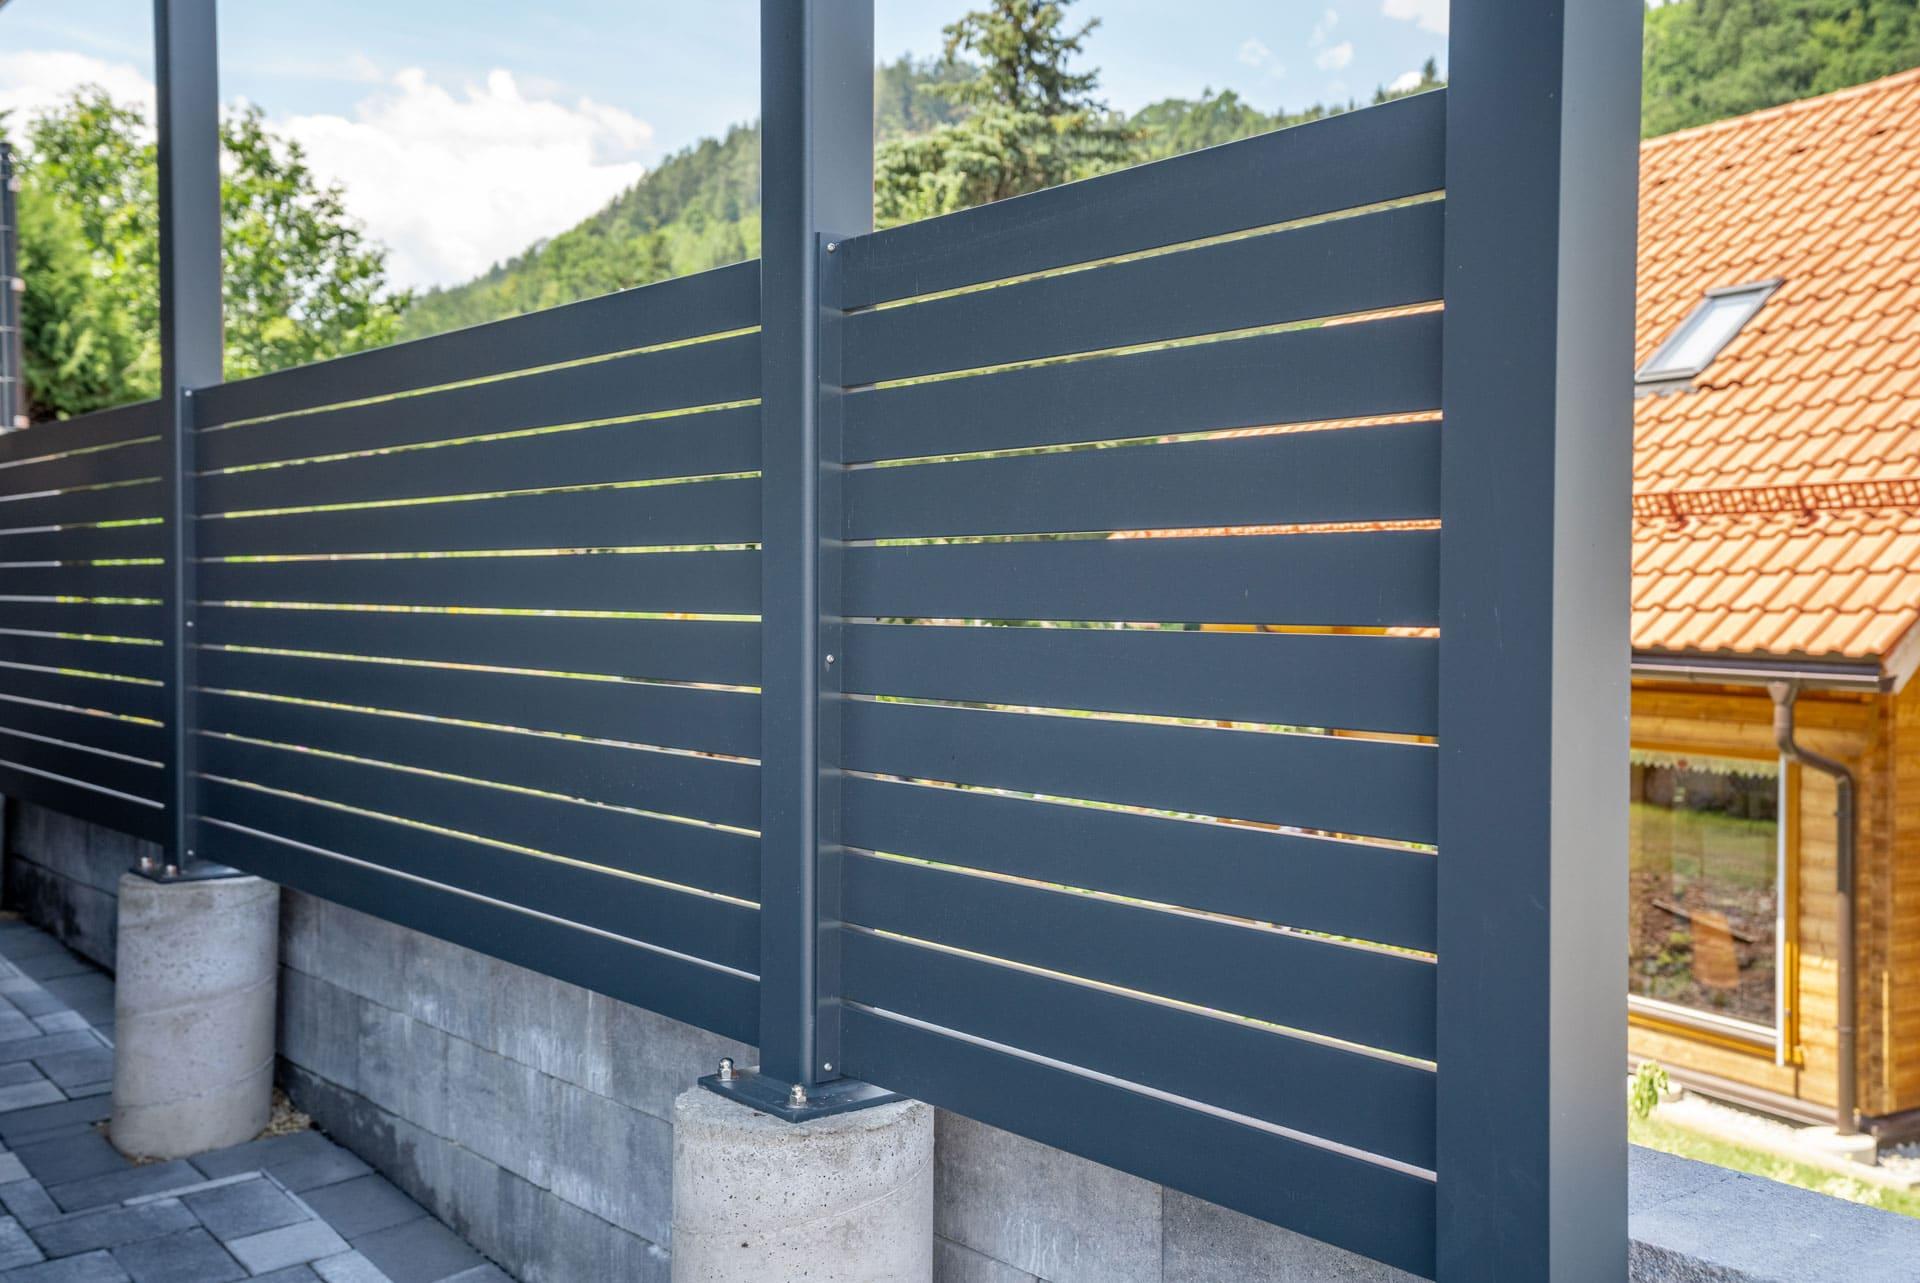 Sichtschutz 25 b | Aluminium Querlattung Anthrazit bei Carport | Svoboda Metalltechnik